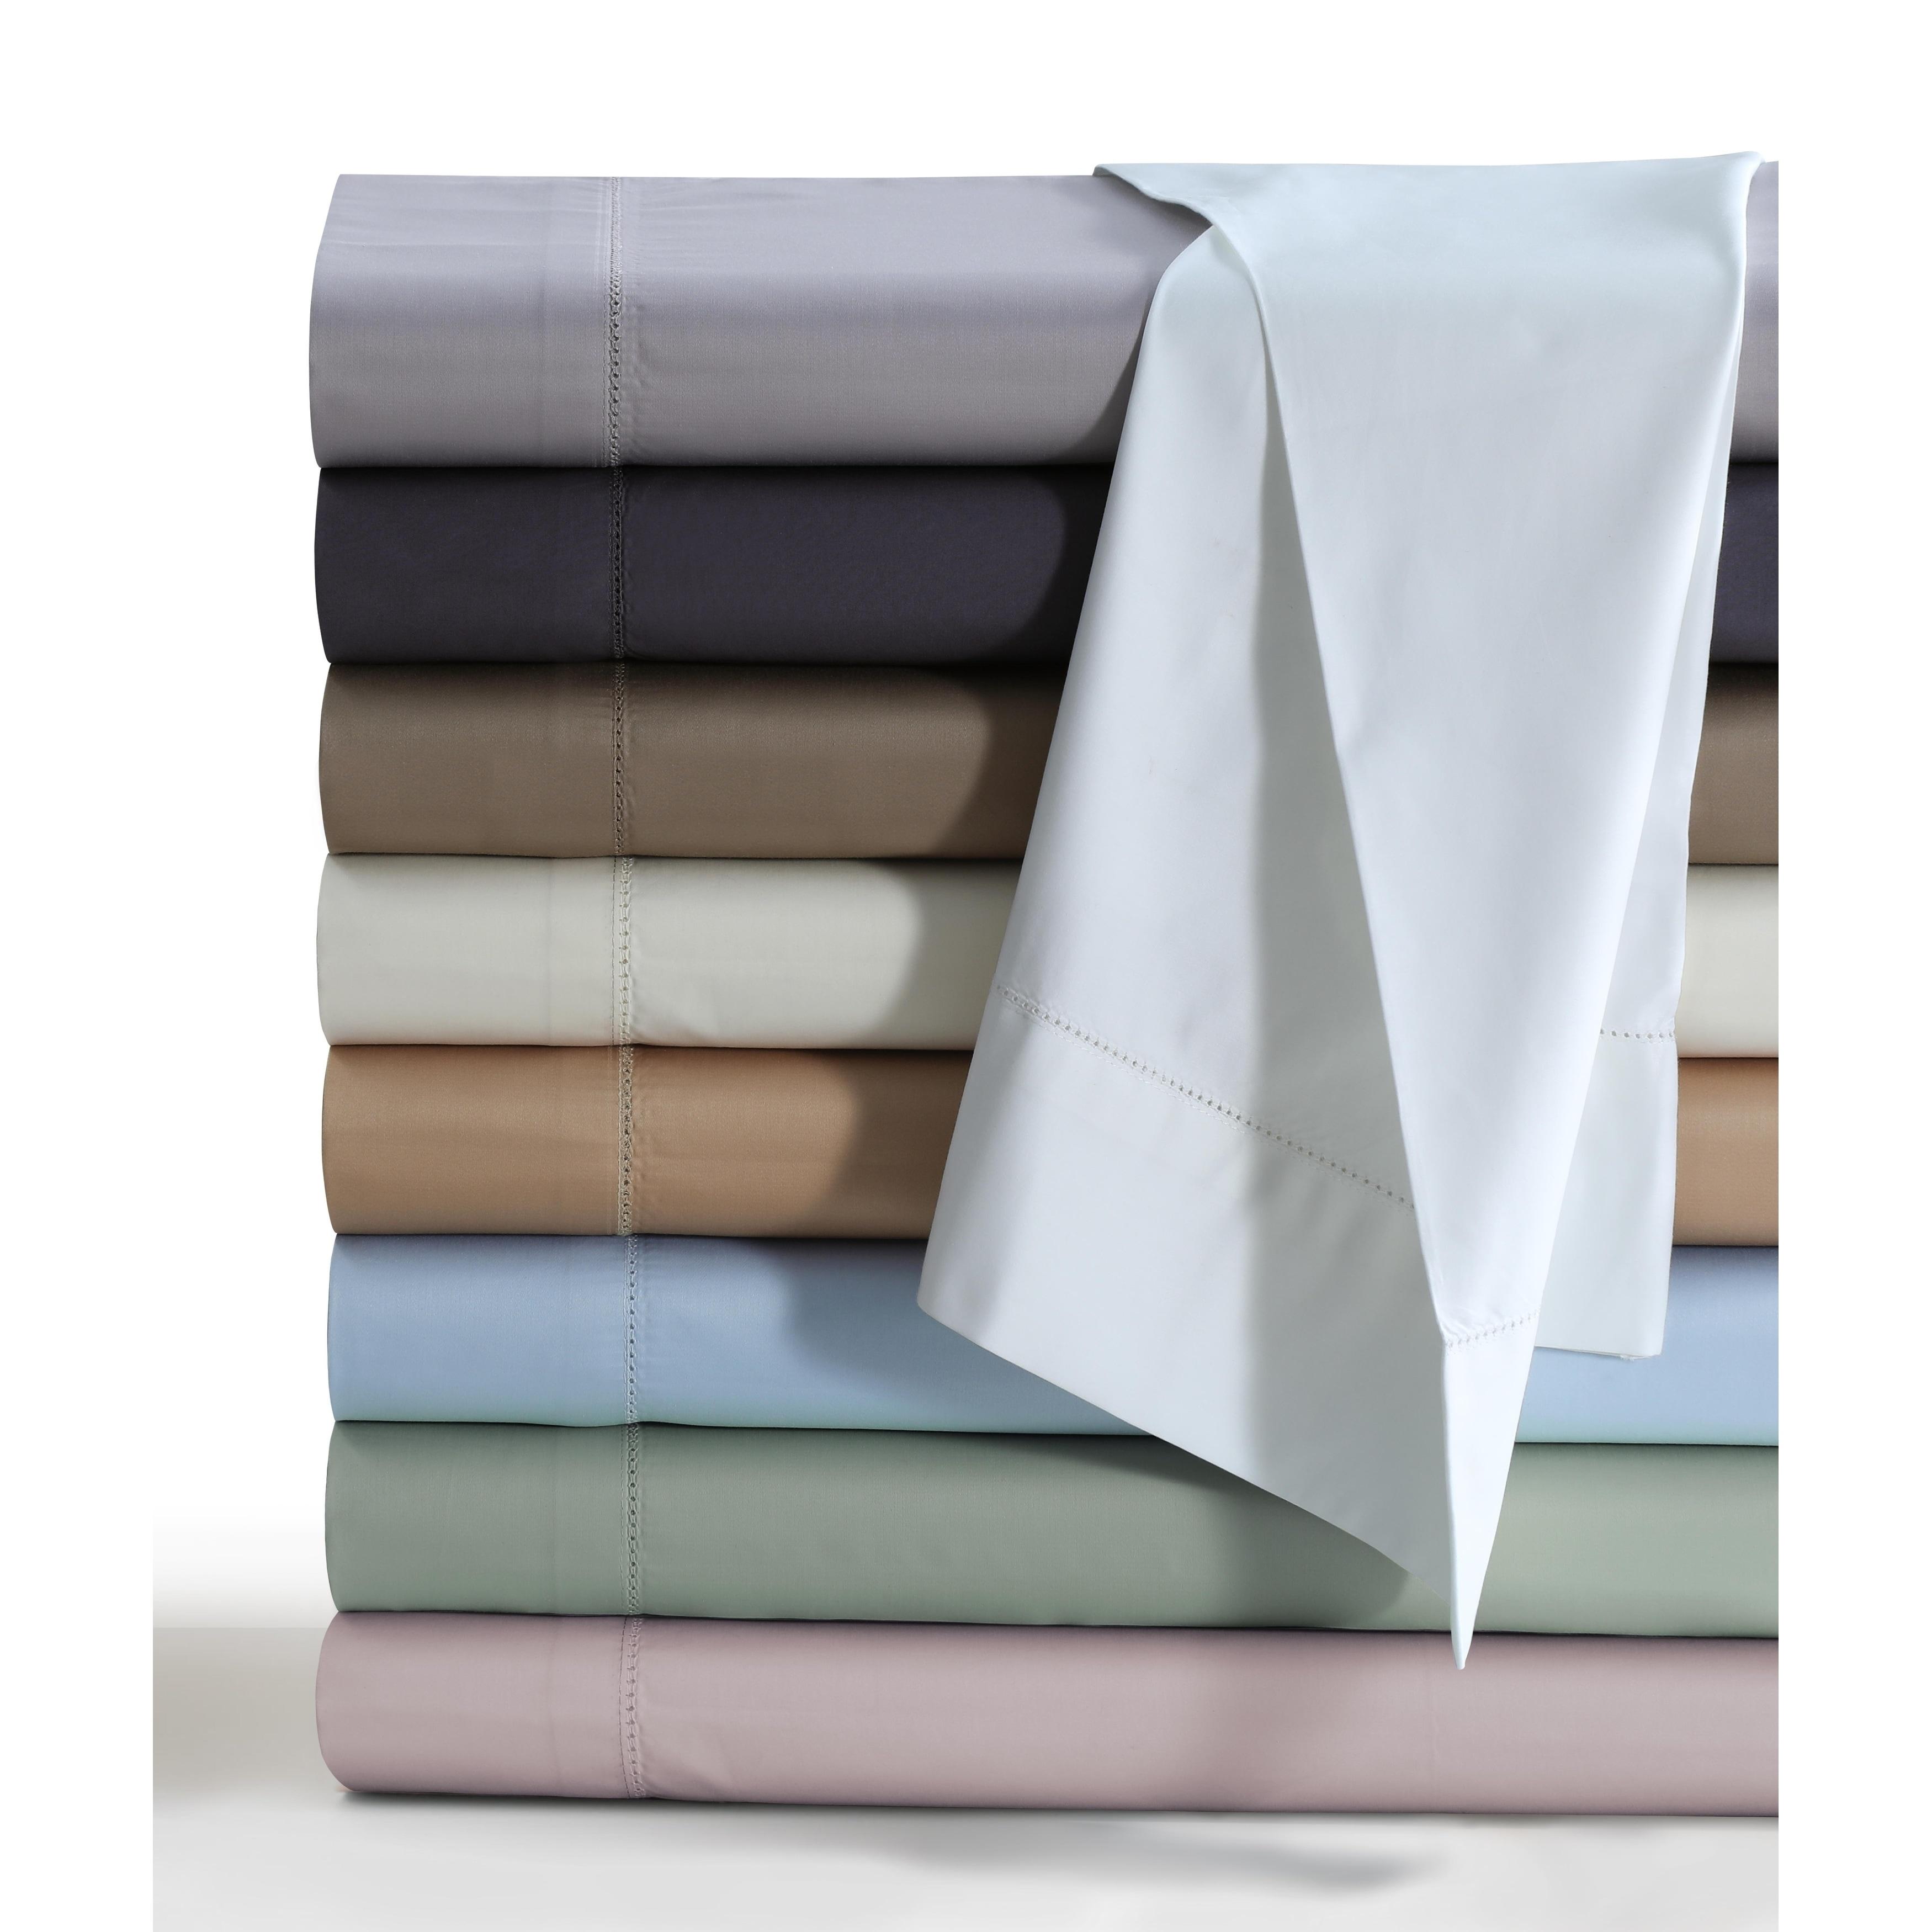 Egyptian Cotton 800 Tc Deep Pocket Sheet Set With Luxury Size Flat